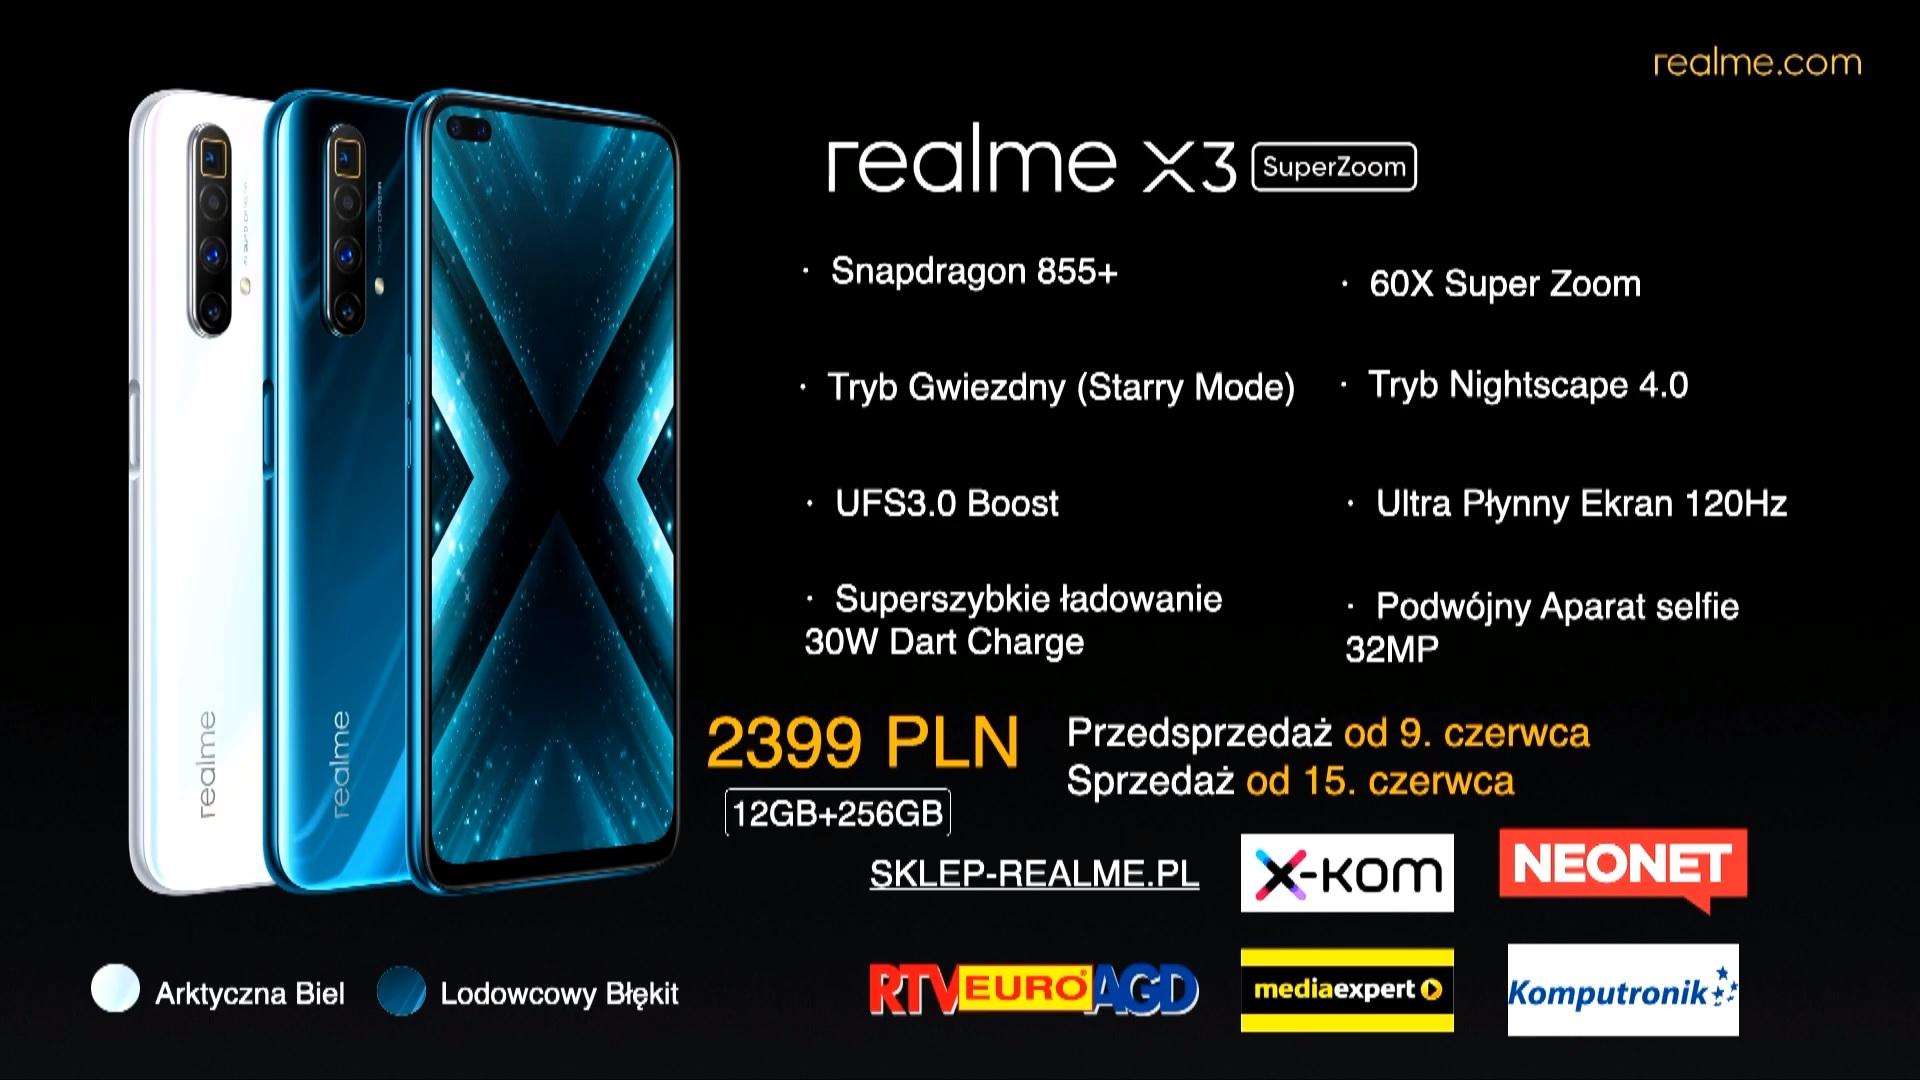 realme X3 SuperZoom price Poland